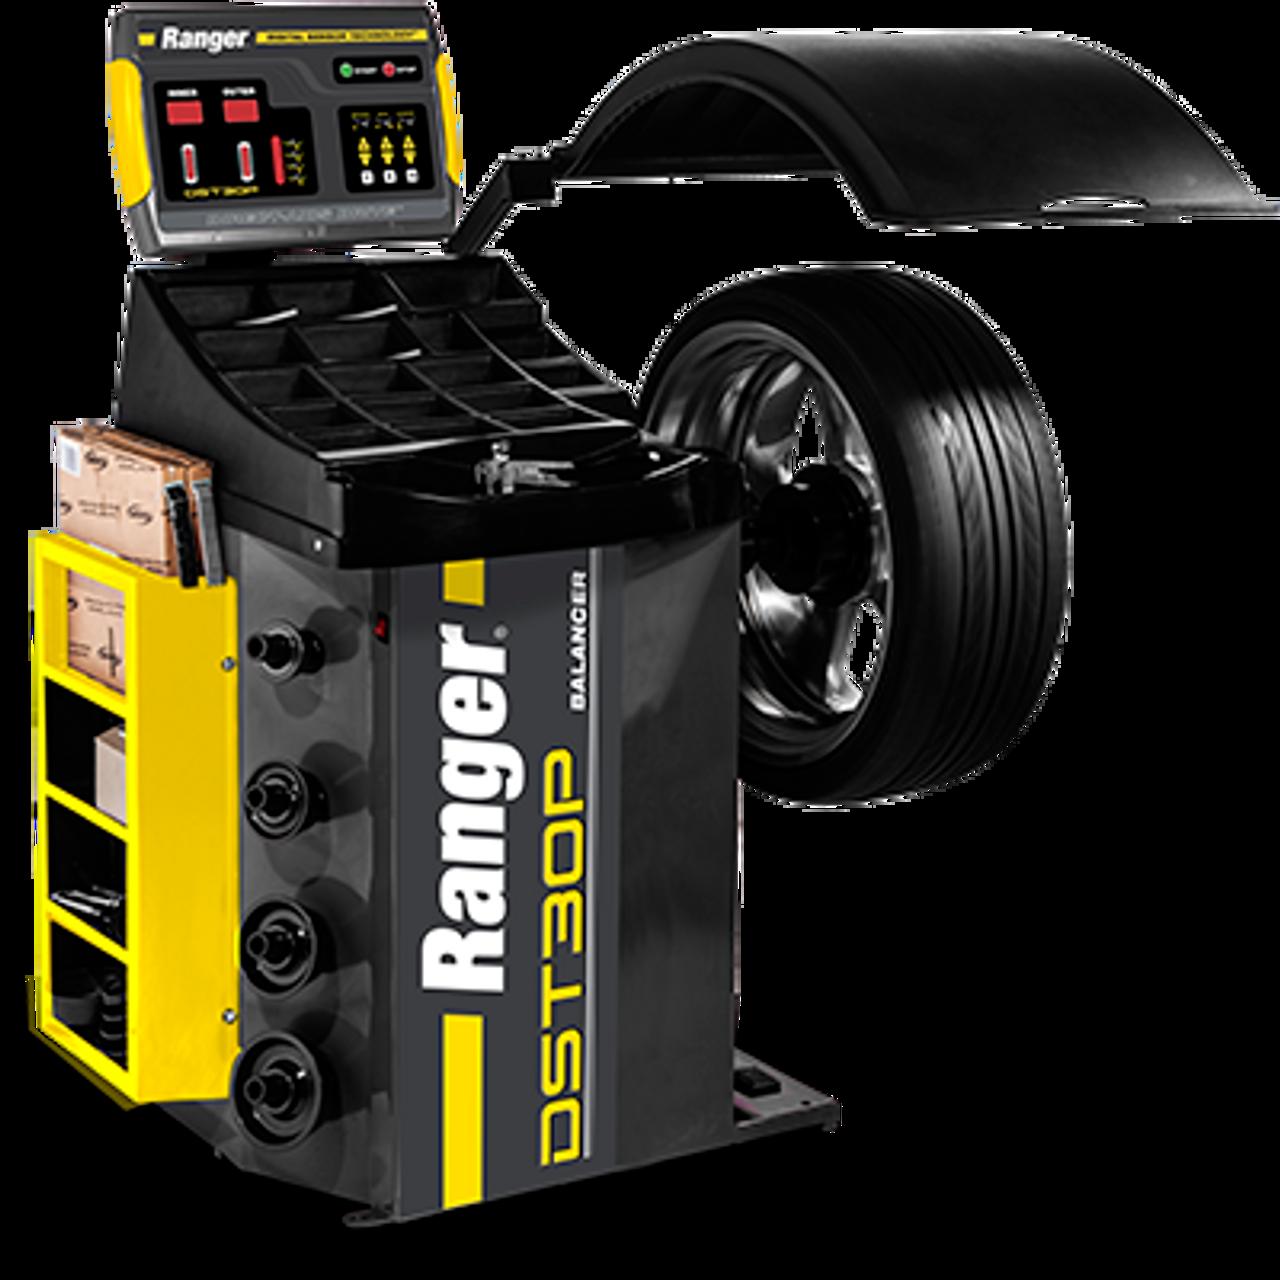 dst30p-wheel-balancer-5140300-ranger-products (2)